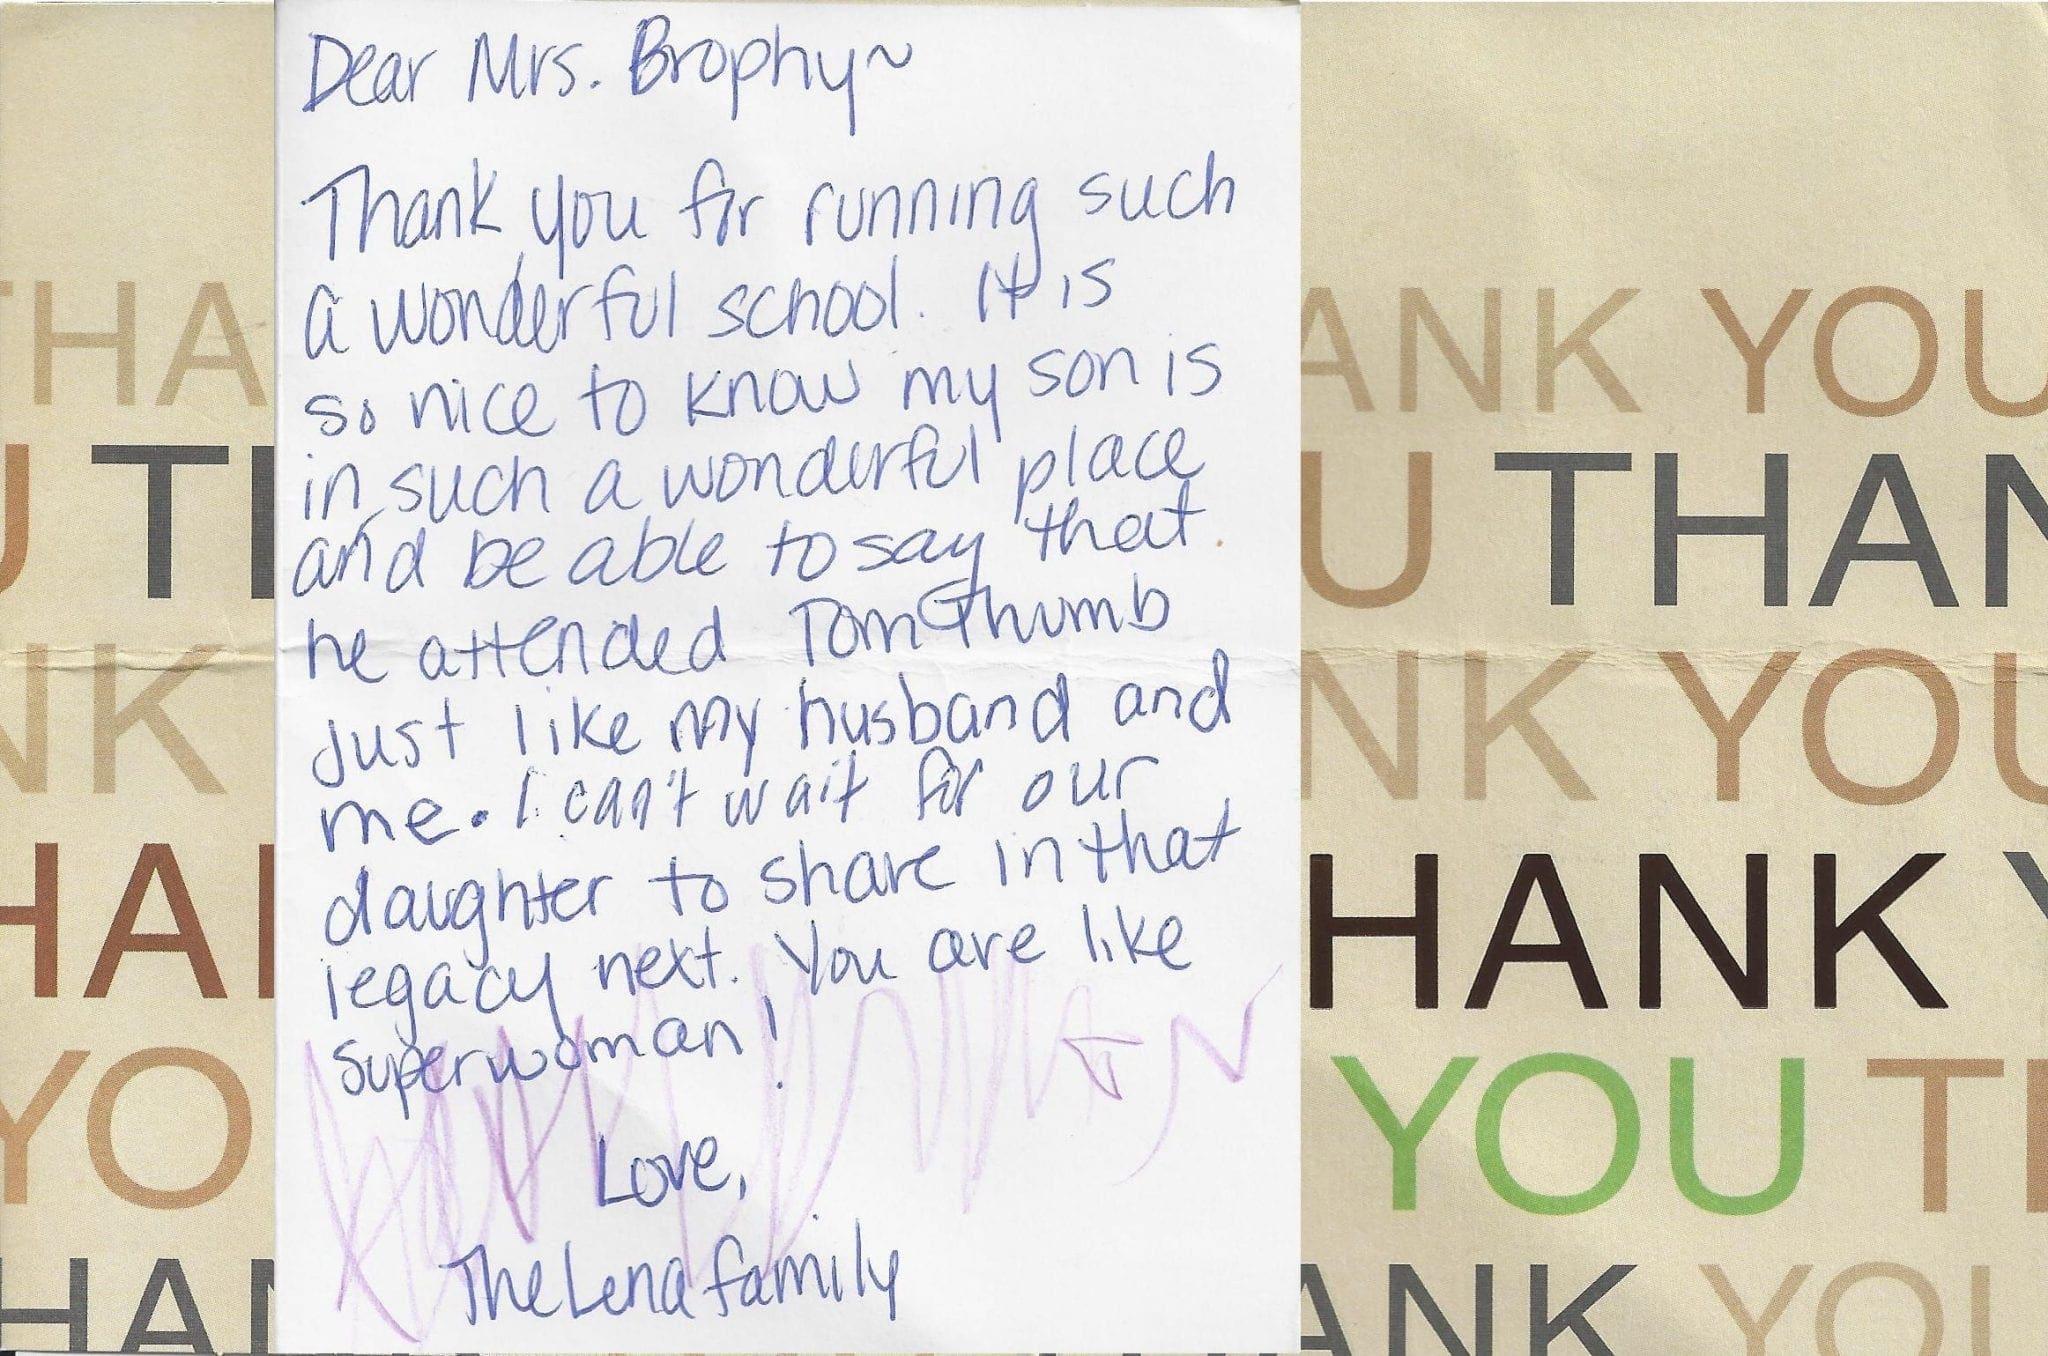 Tom Thumb Alumni Thank You Note